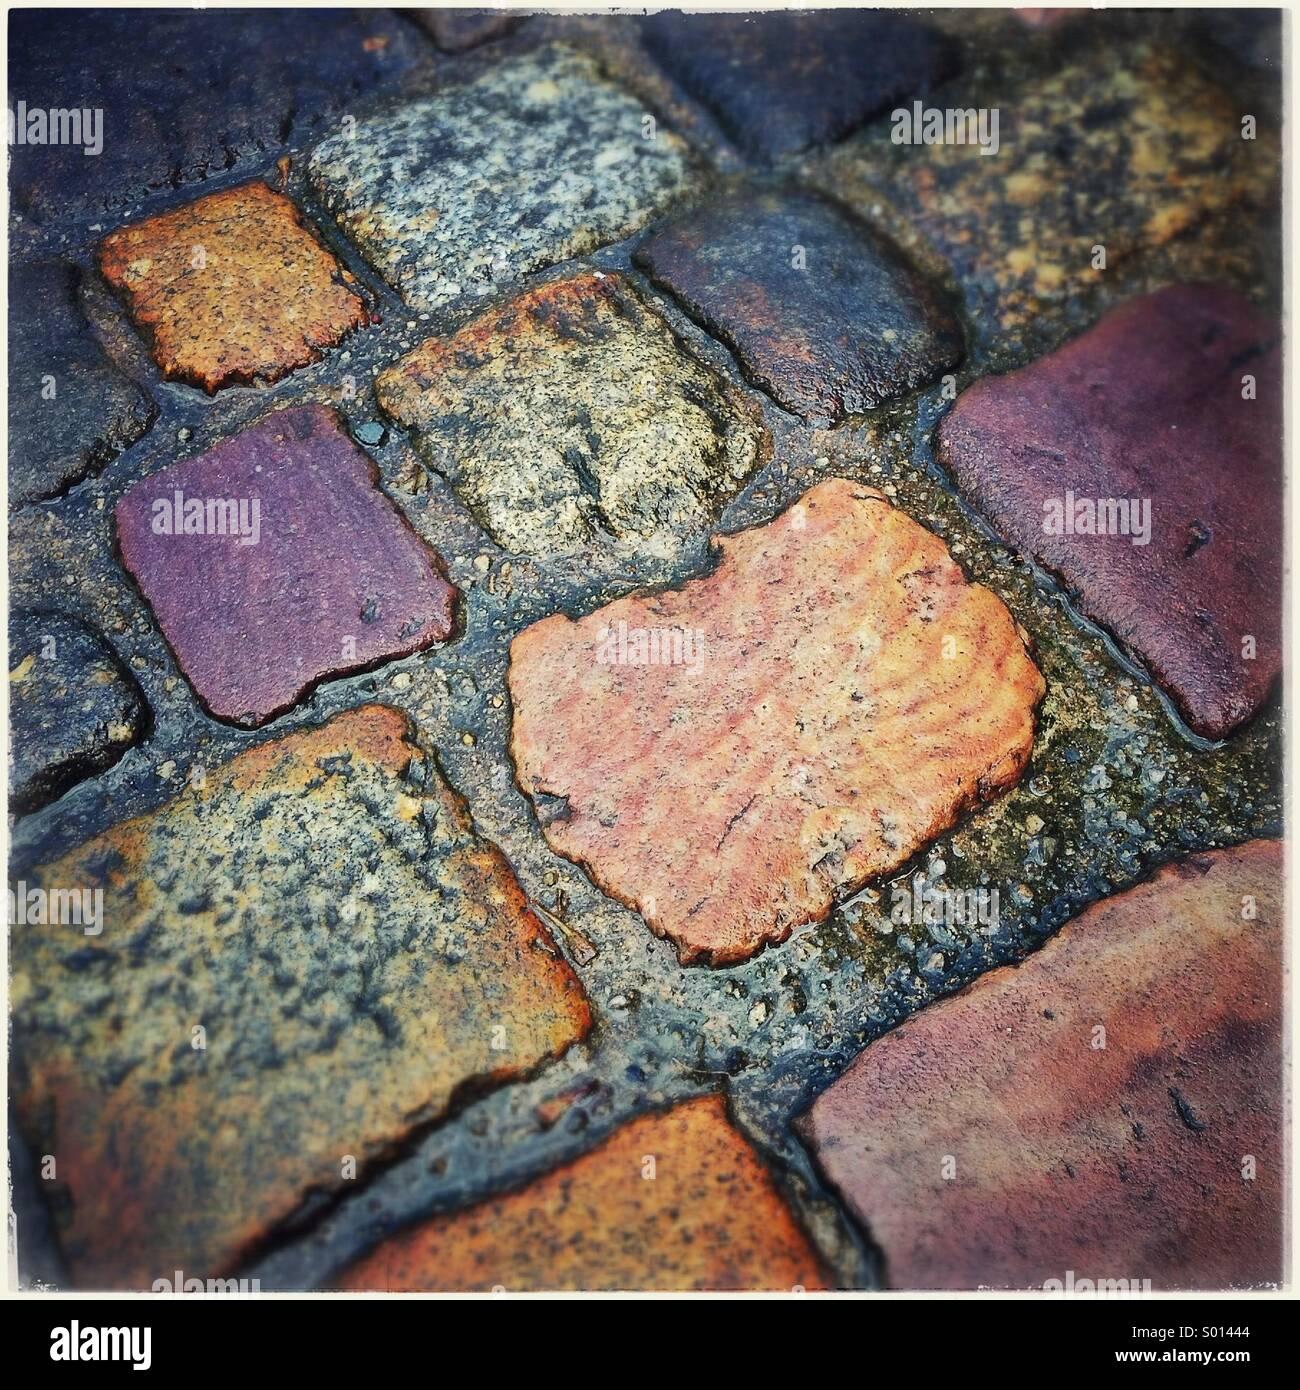 Cobblestone street detail in Dinan, France - Stock Image